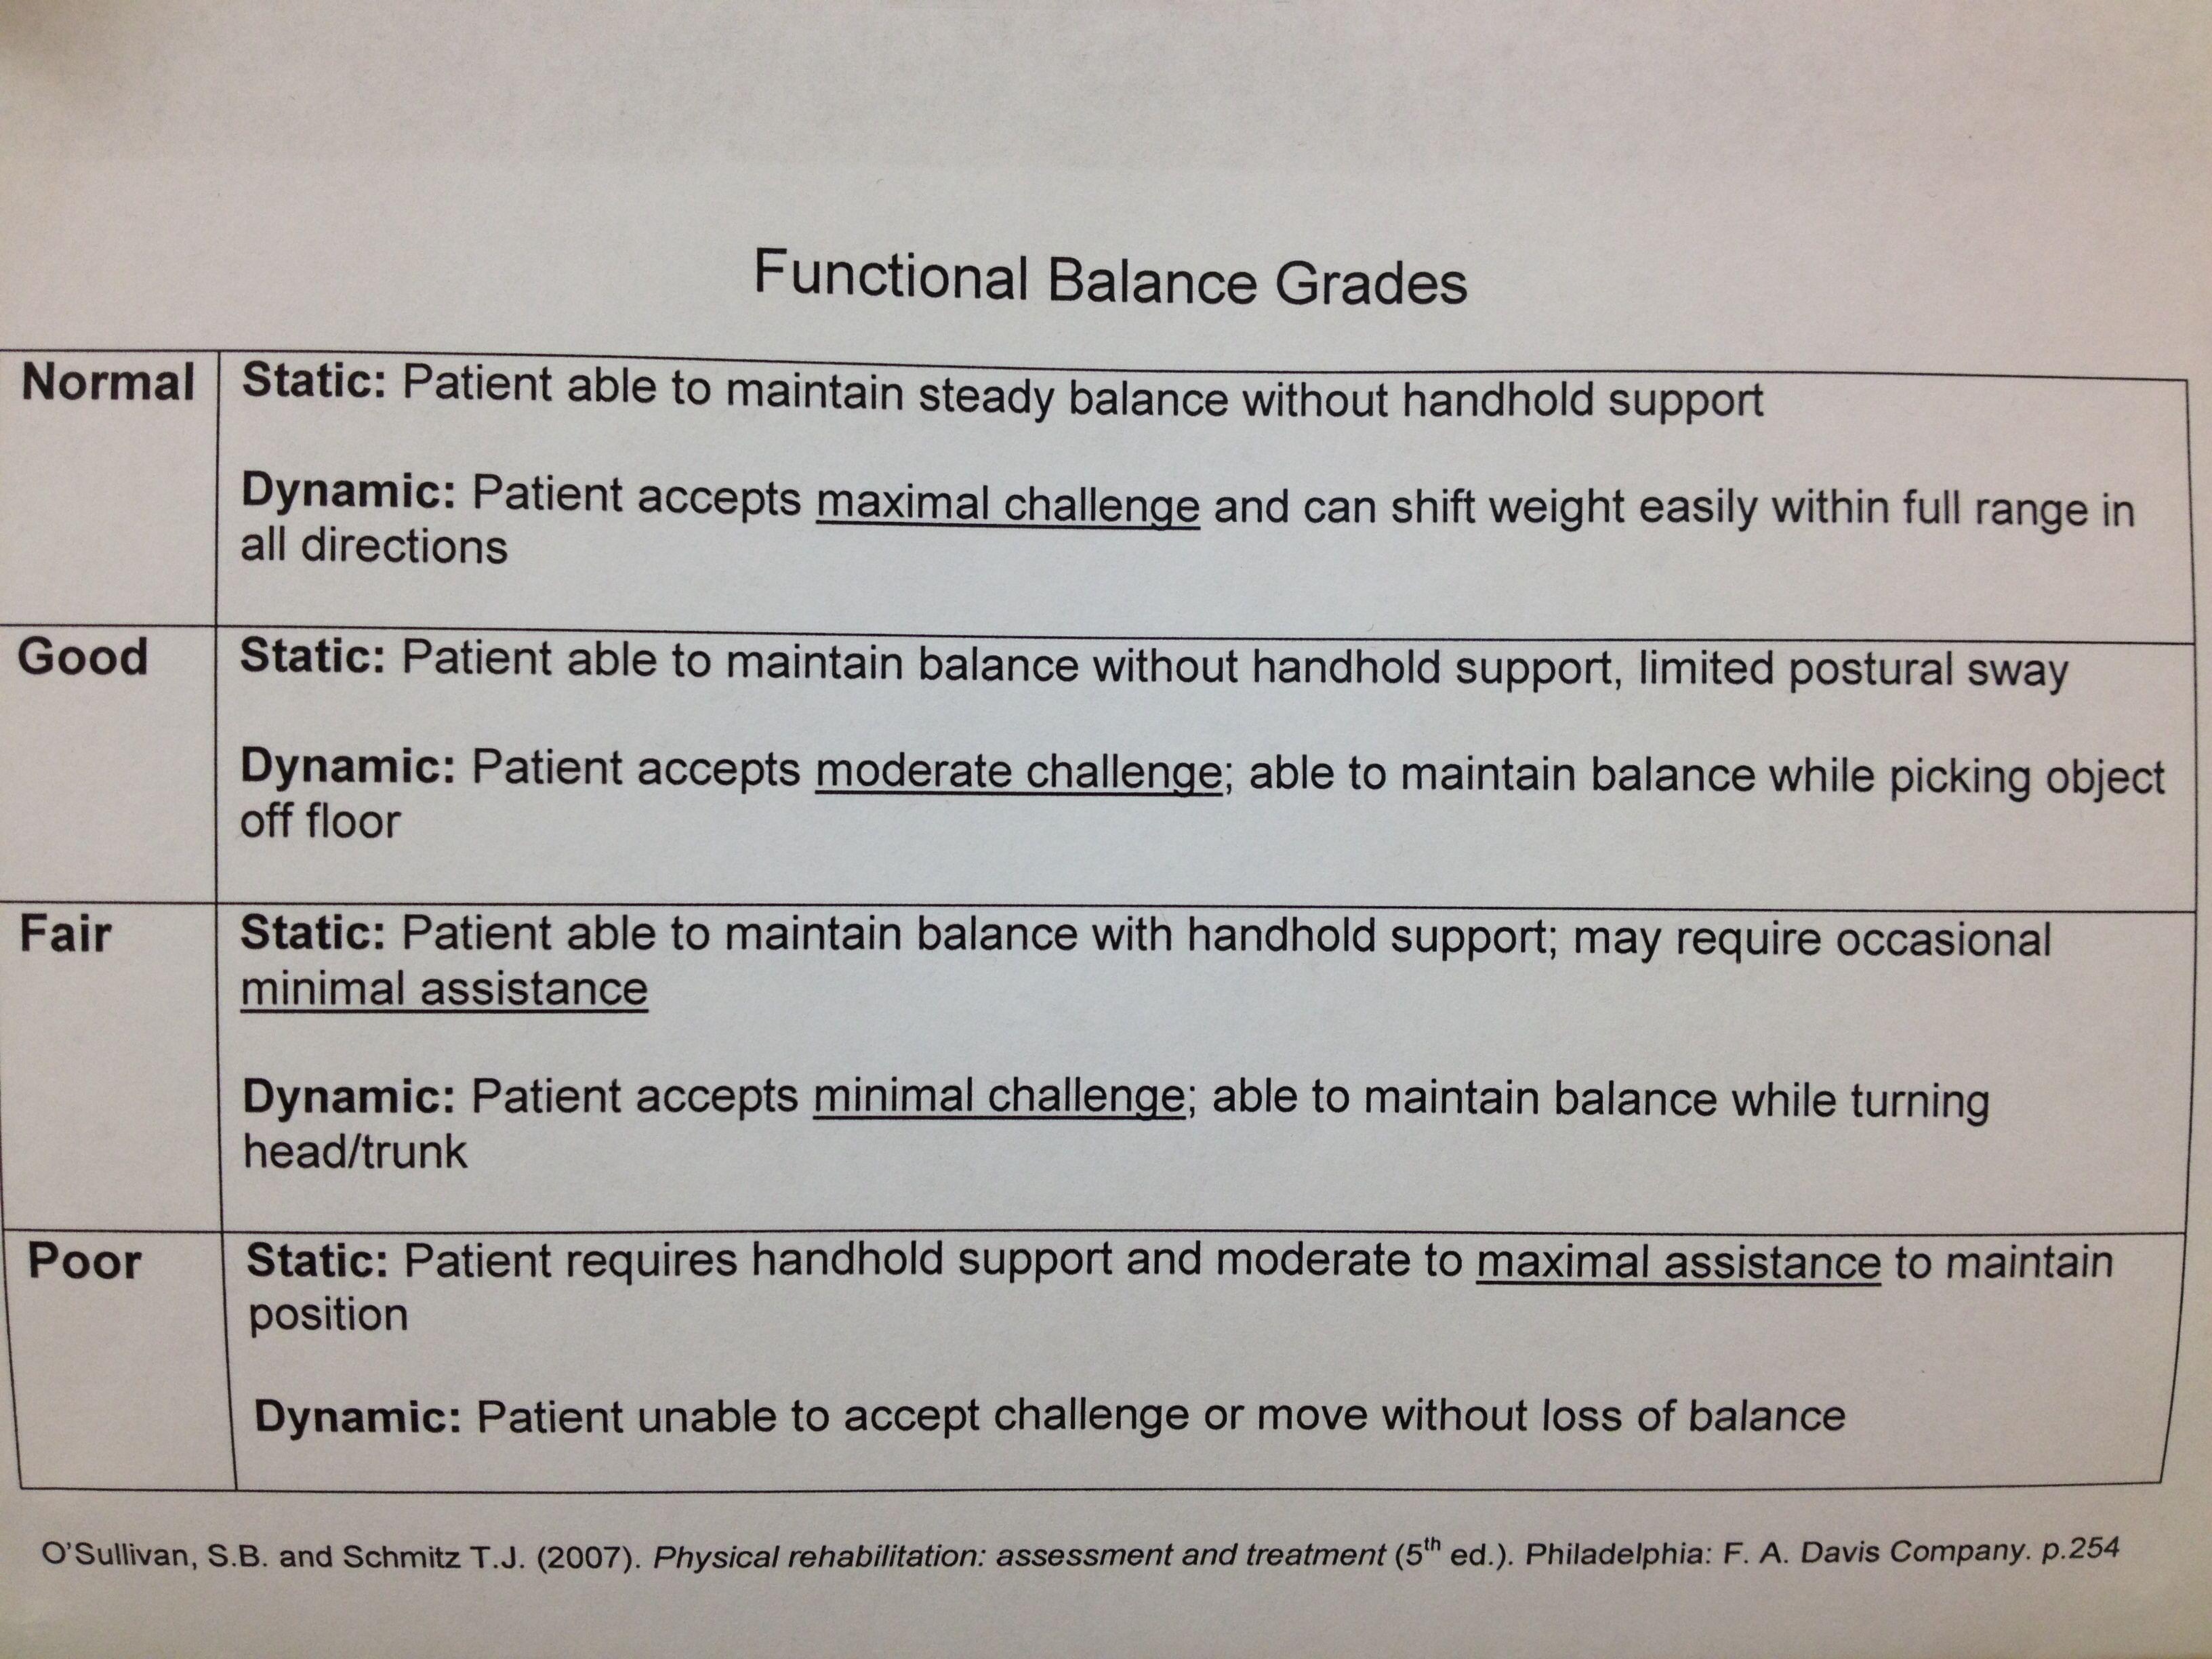 Functional Balance Grades